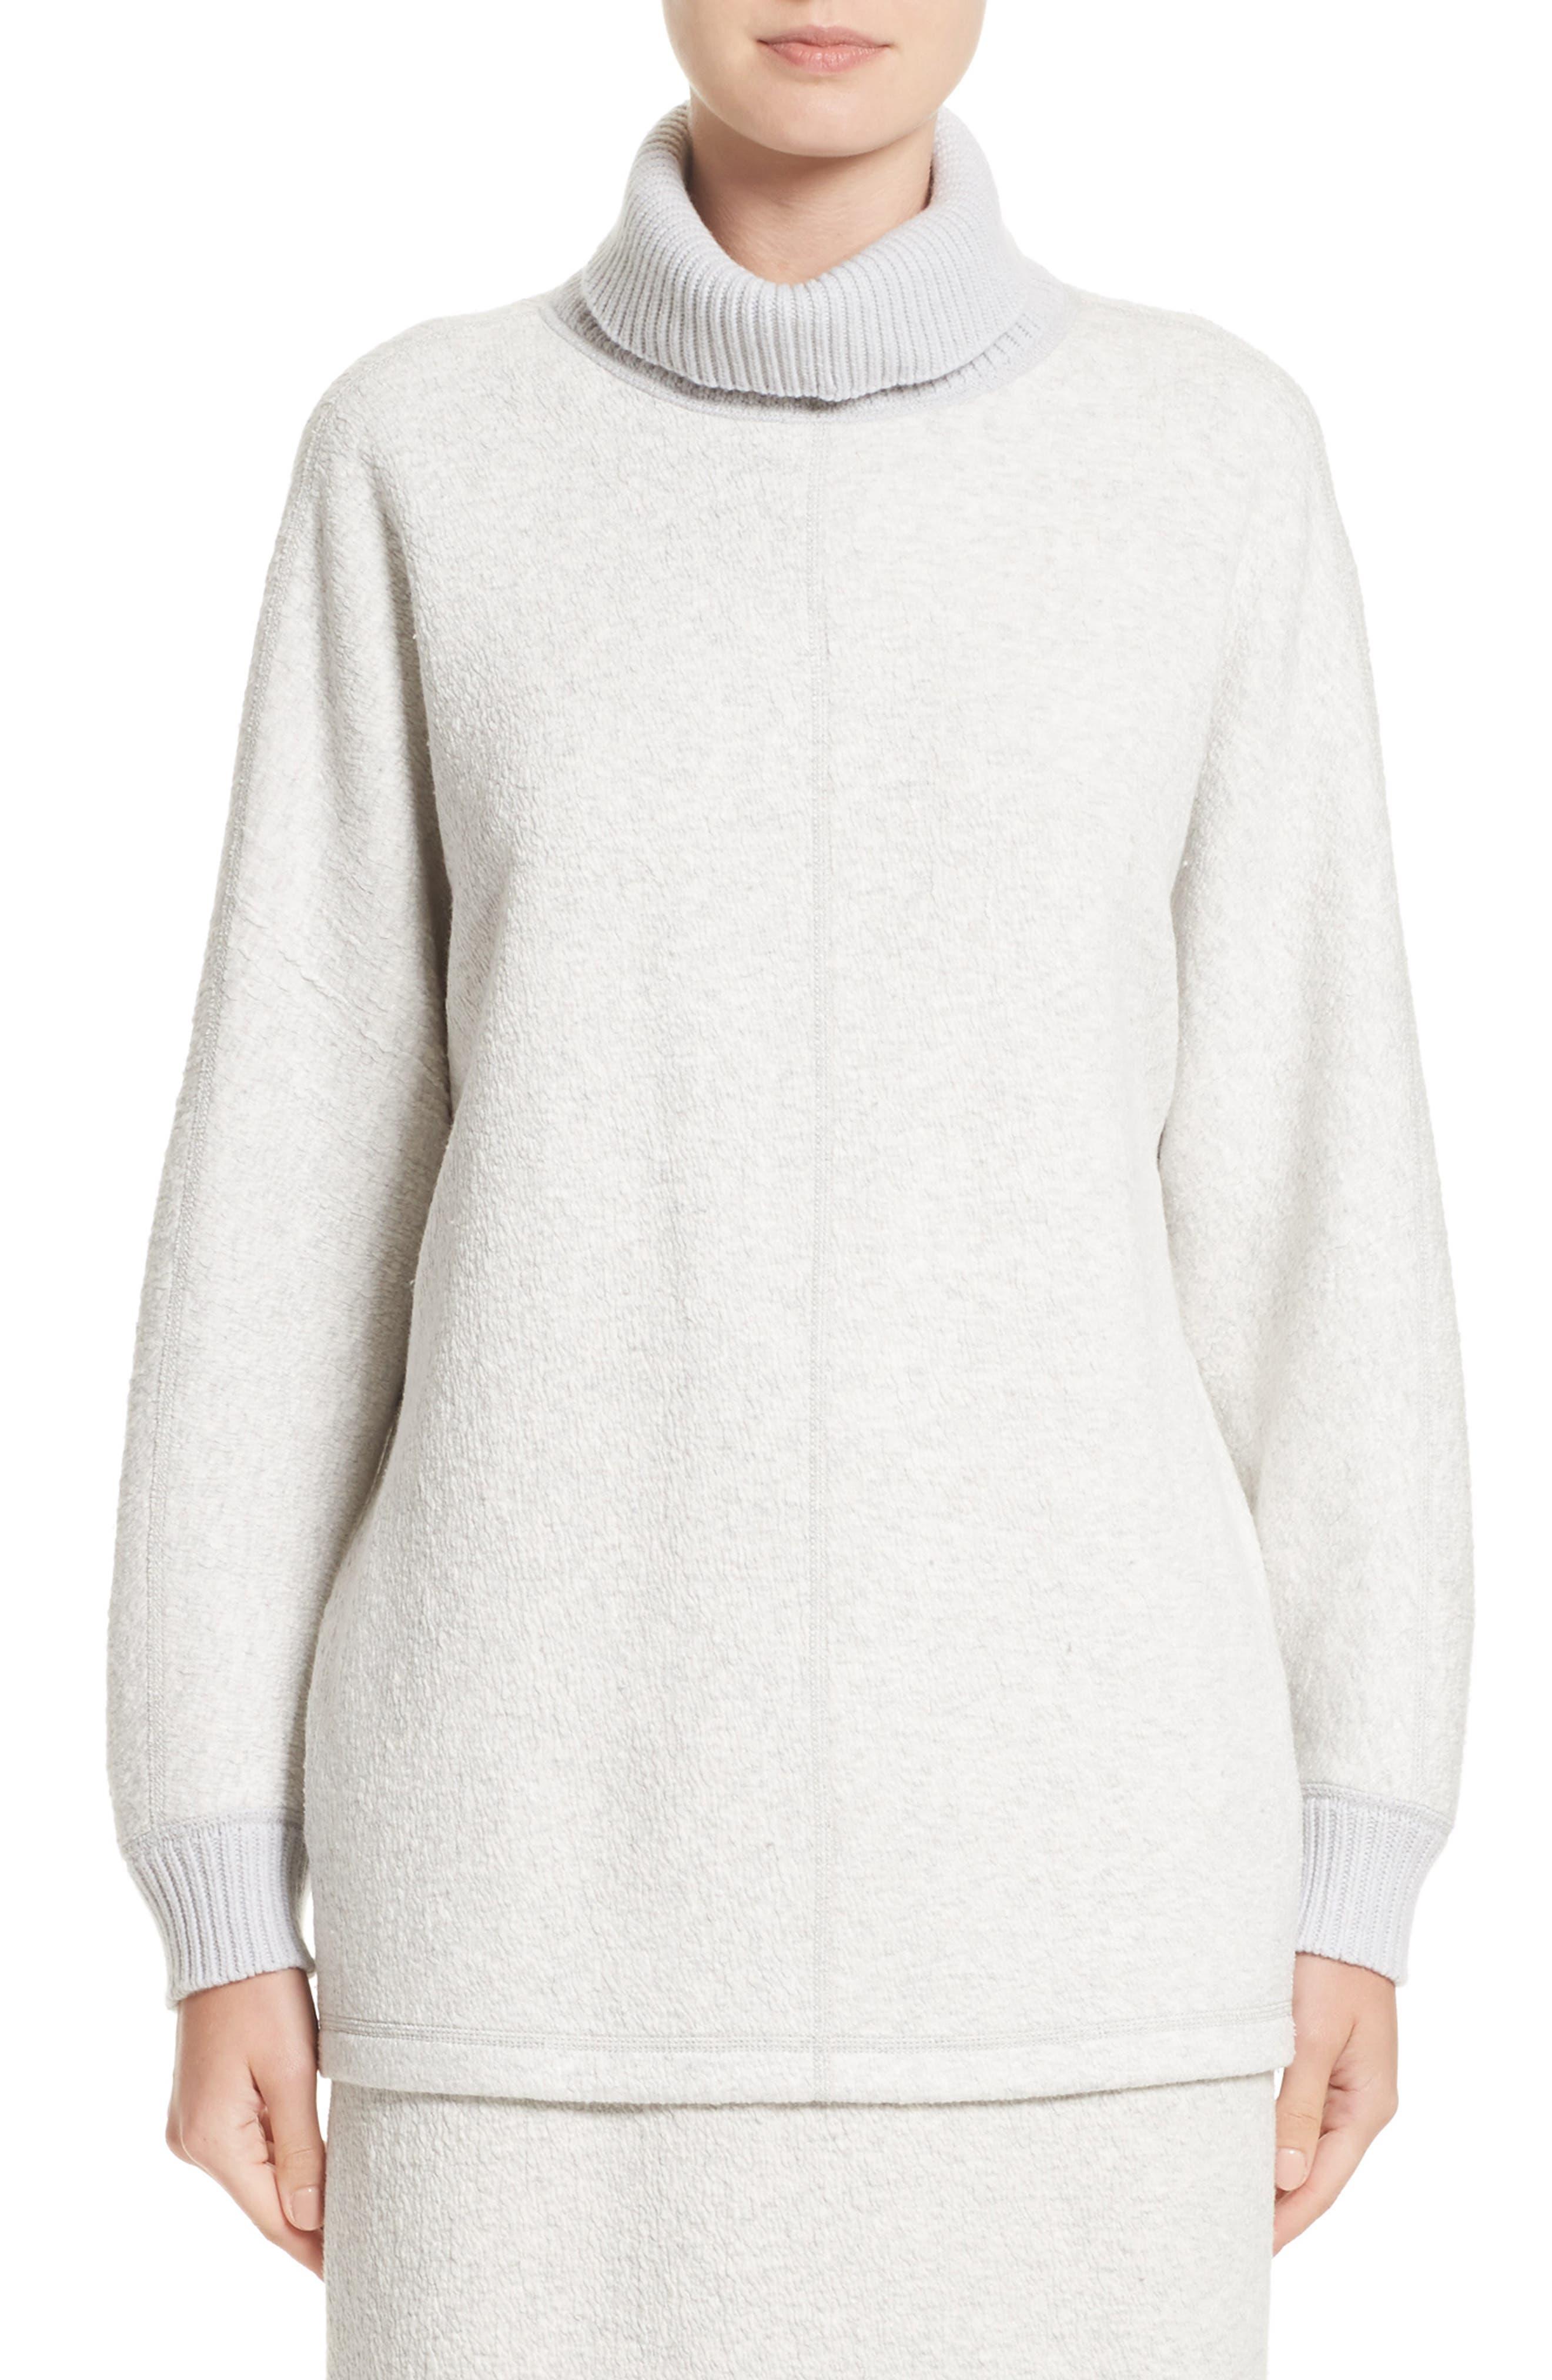 Lafayette 148 New York Rib Knit Turtleneck Sweater